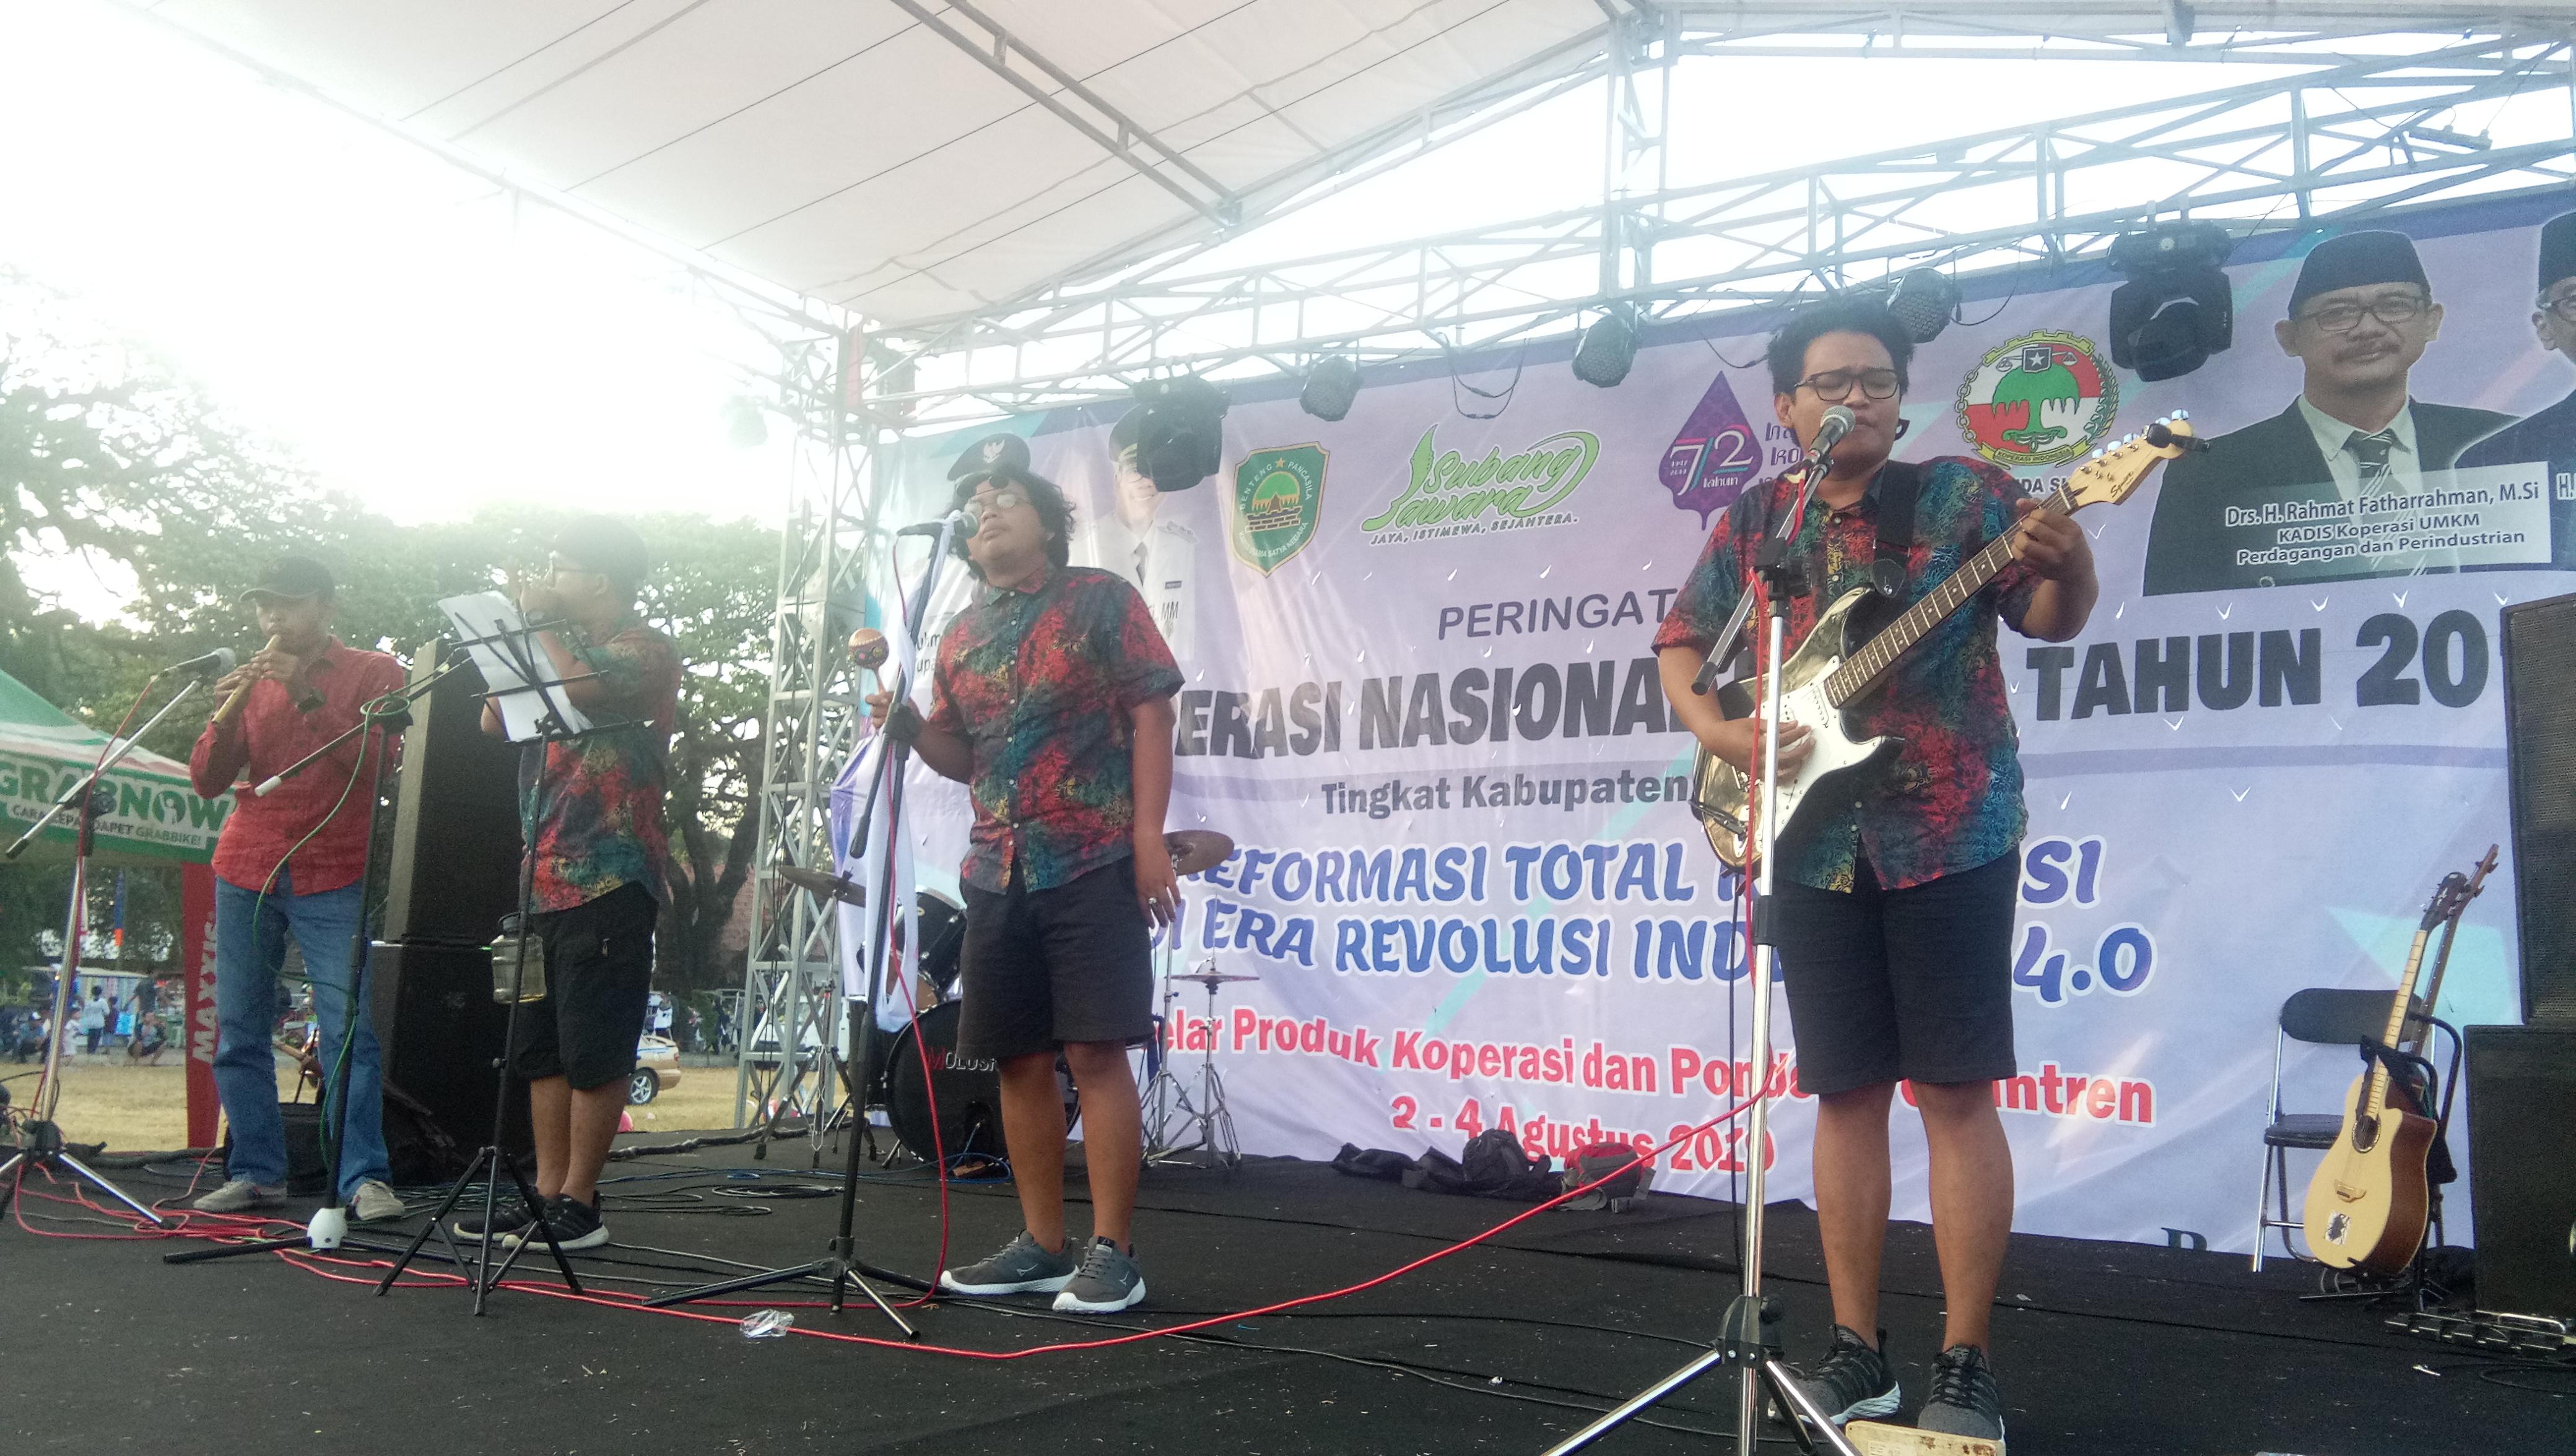 Grup Ambek Adil Paramarta Musik Sebagai Media Mengungkapkan Kegelisahan Pasundan Ekspres